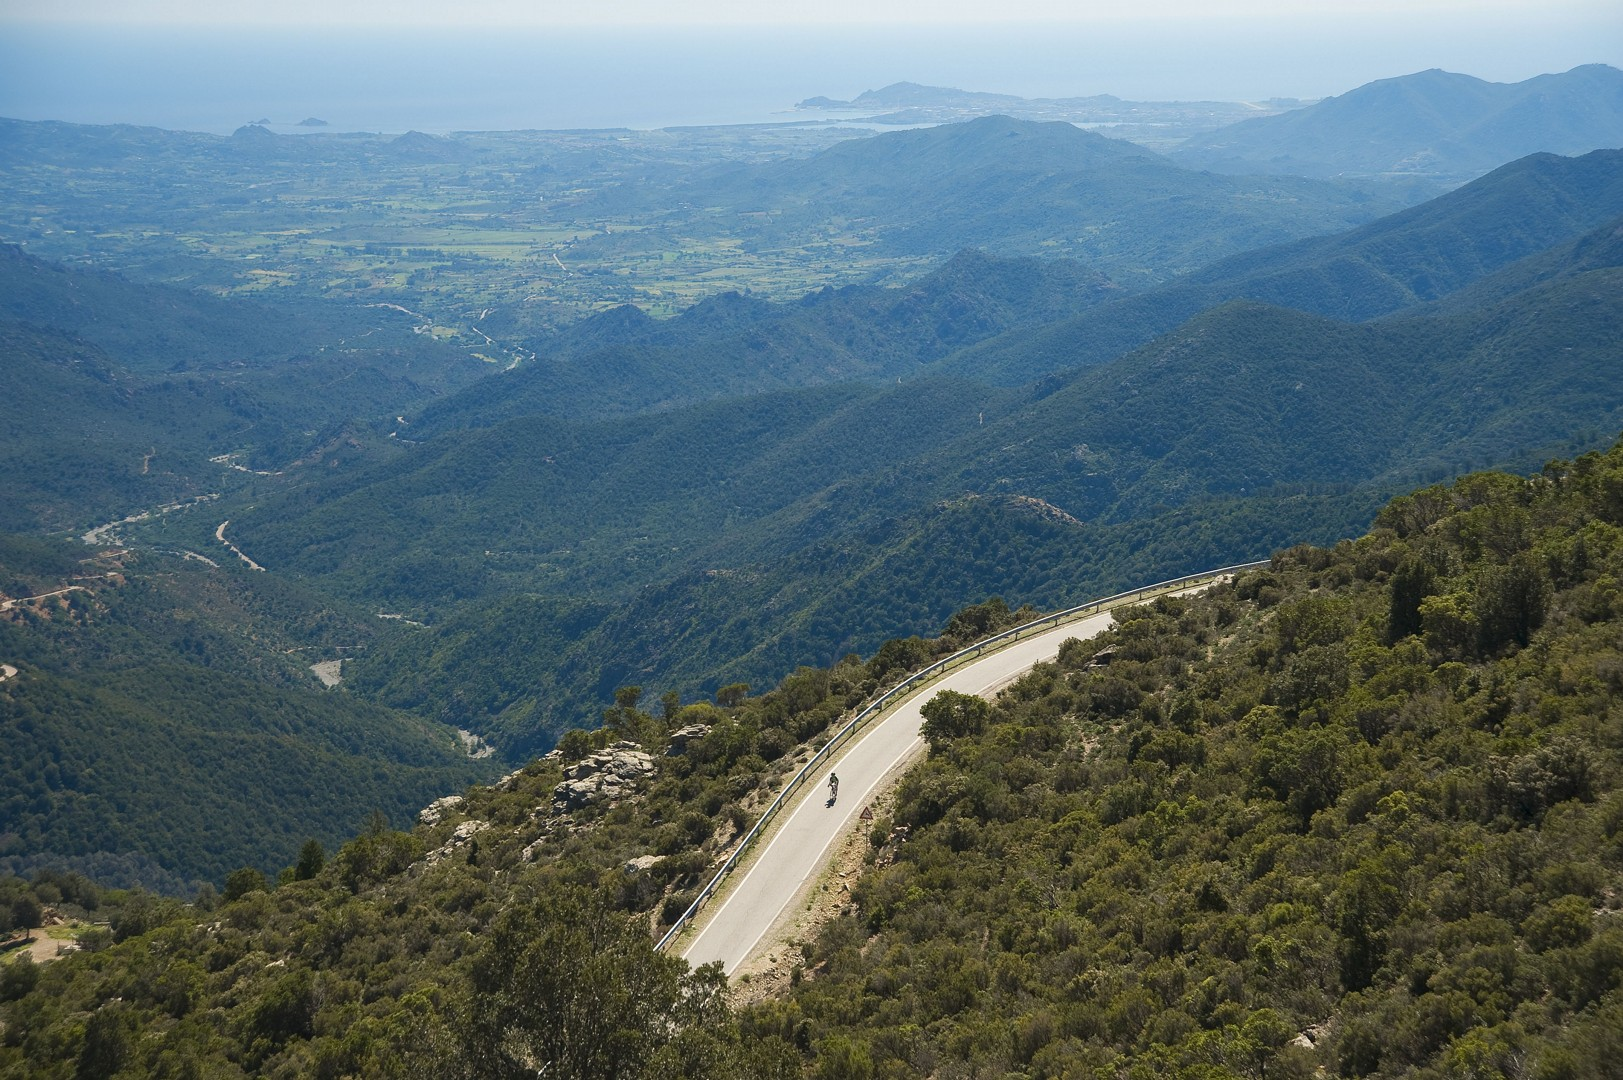 SP2493.jpg - Italy - Sardinia - Mountain Explorer - Guided Road Cycling Holiday - Italia Road Cycling